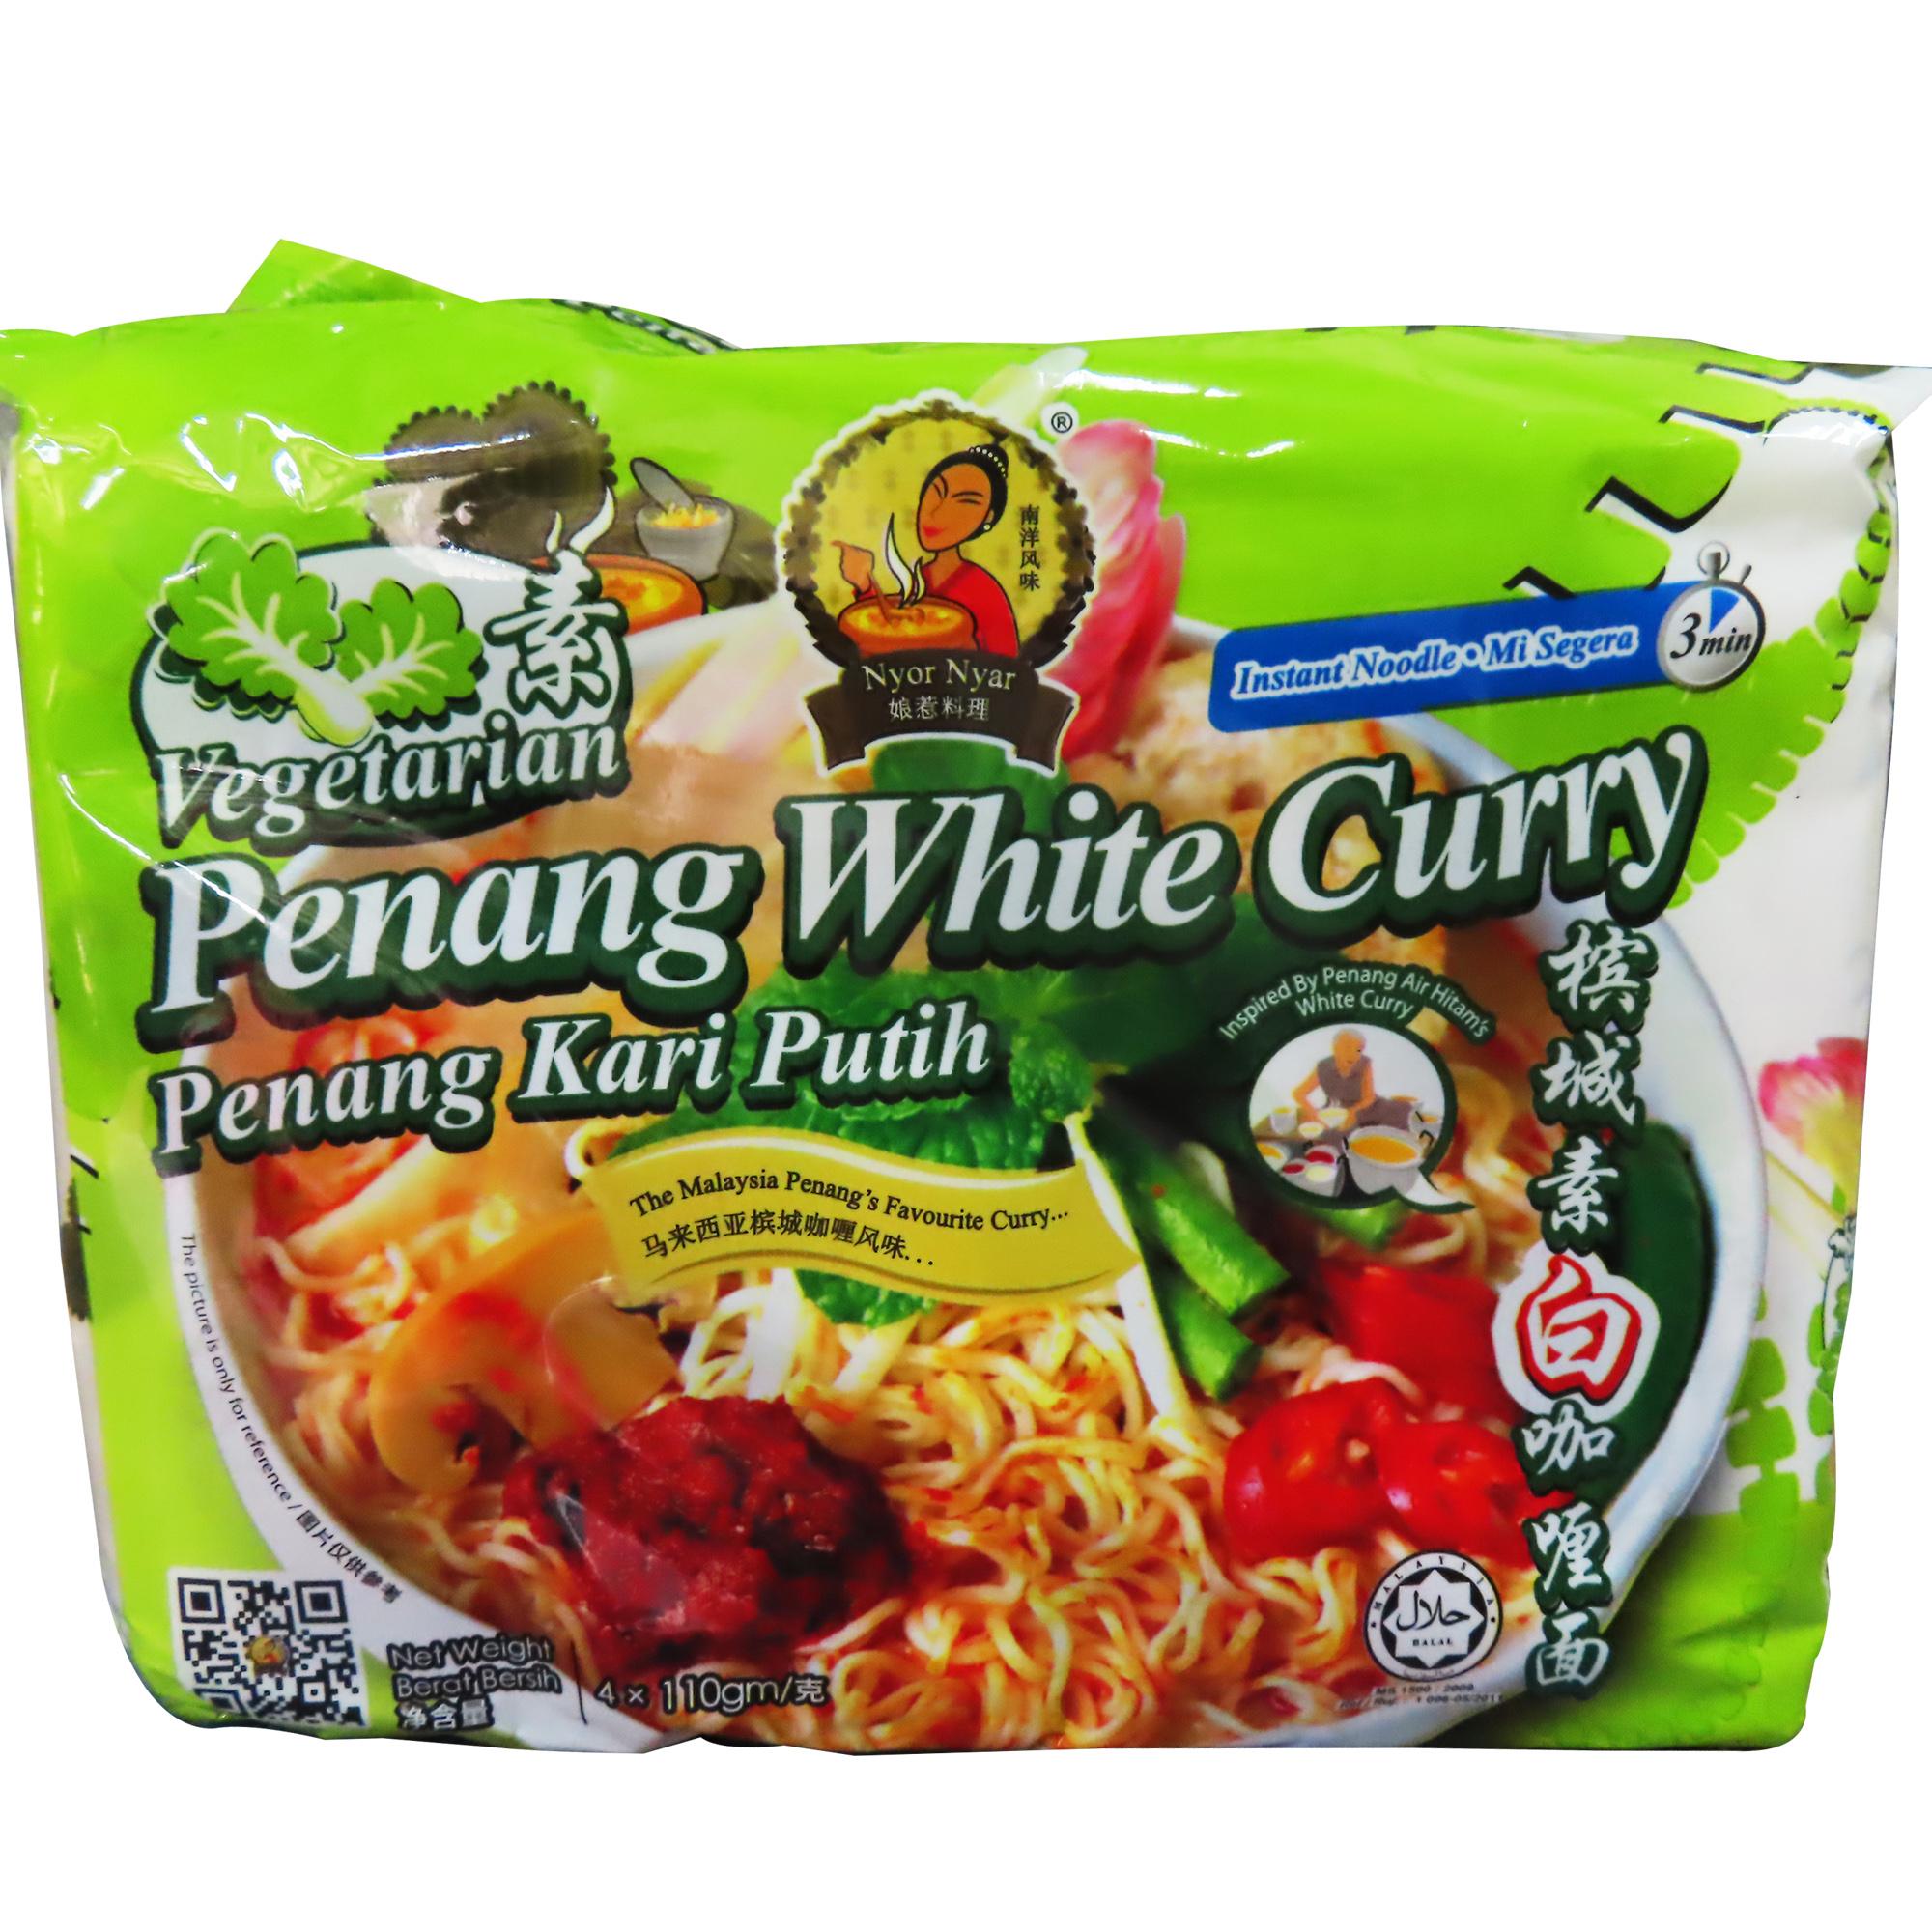 Image Nyor Nyar Vegetarian Penang White Curry Noodles 娘惹-槟城白咖哩面 440grams